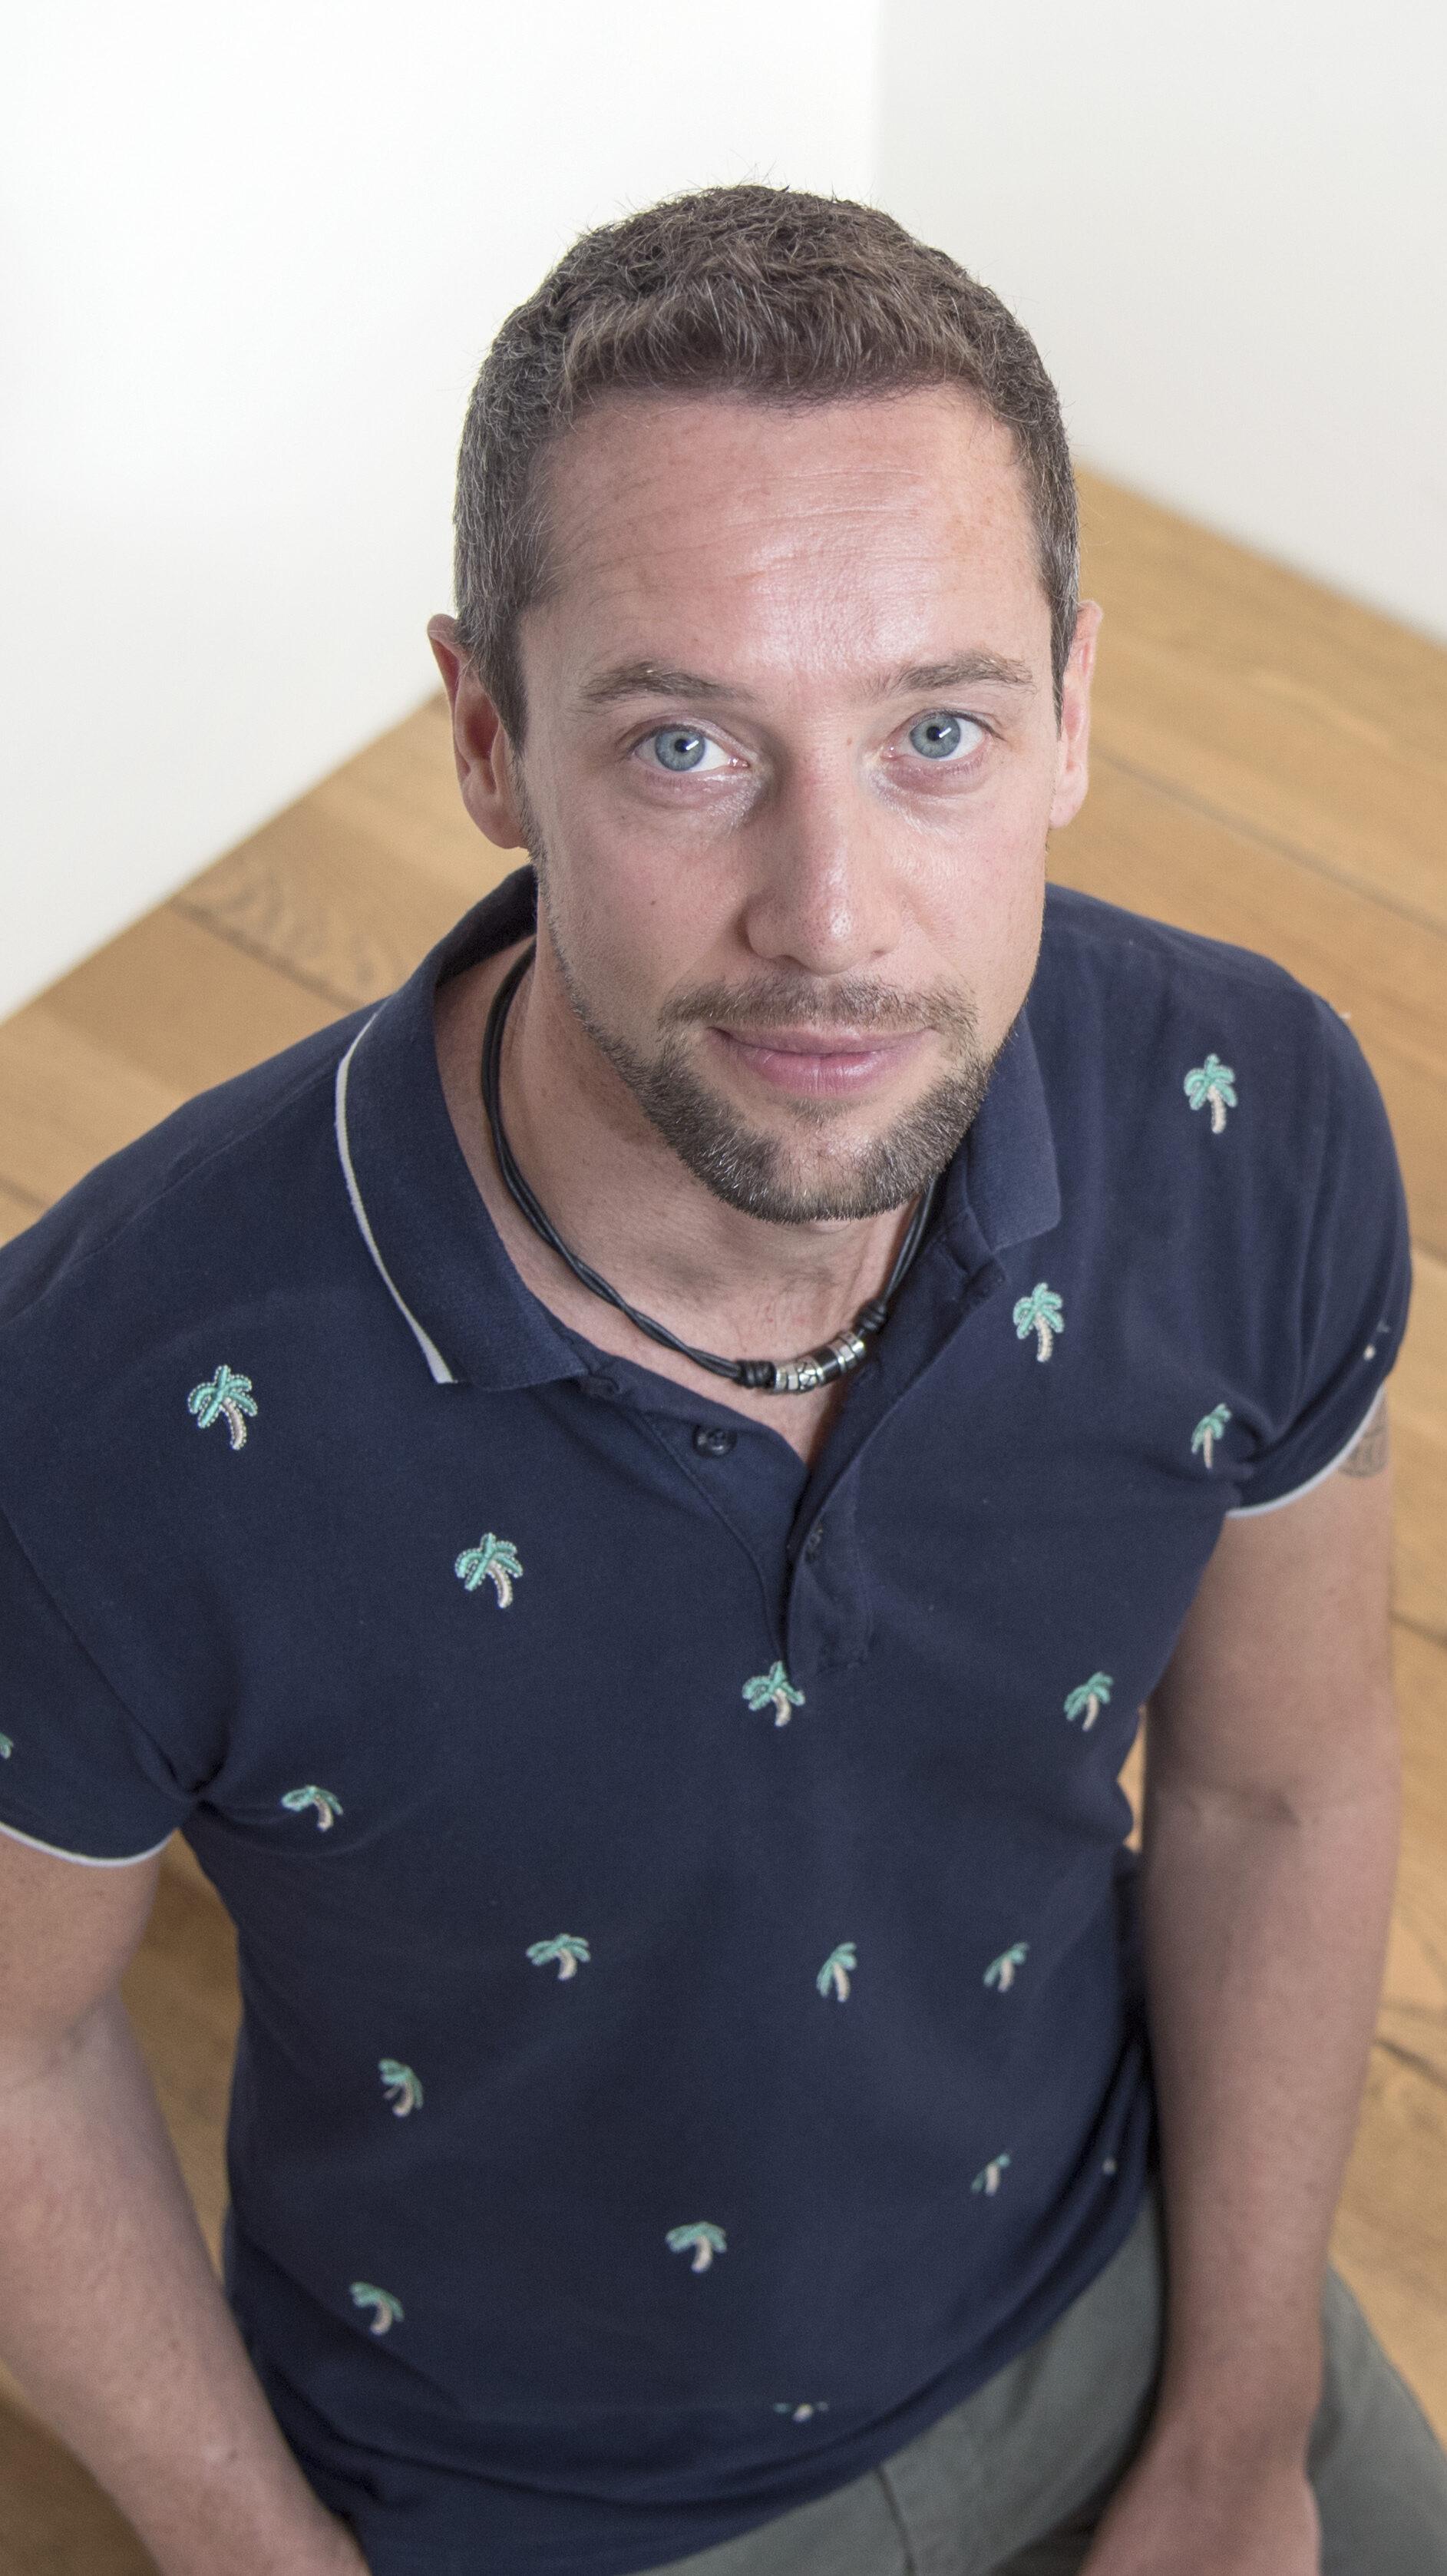 Tim Tiel - Team - FysioHellevoet